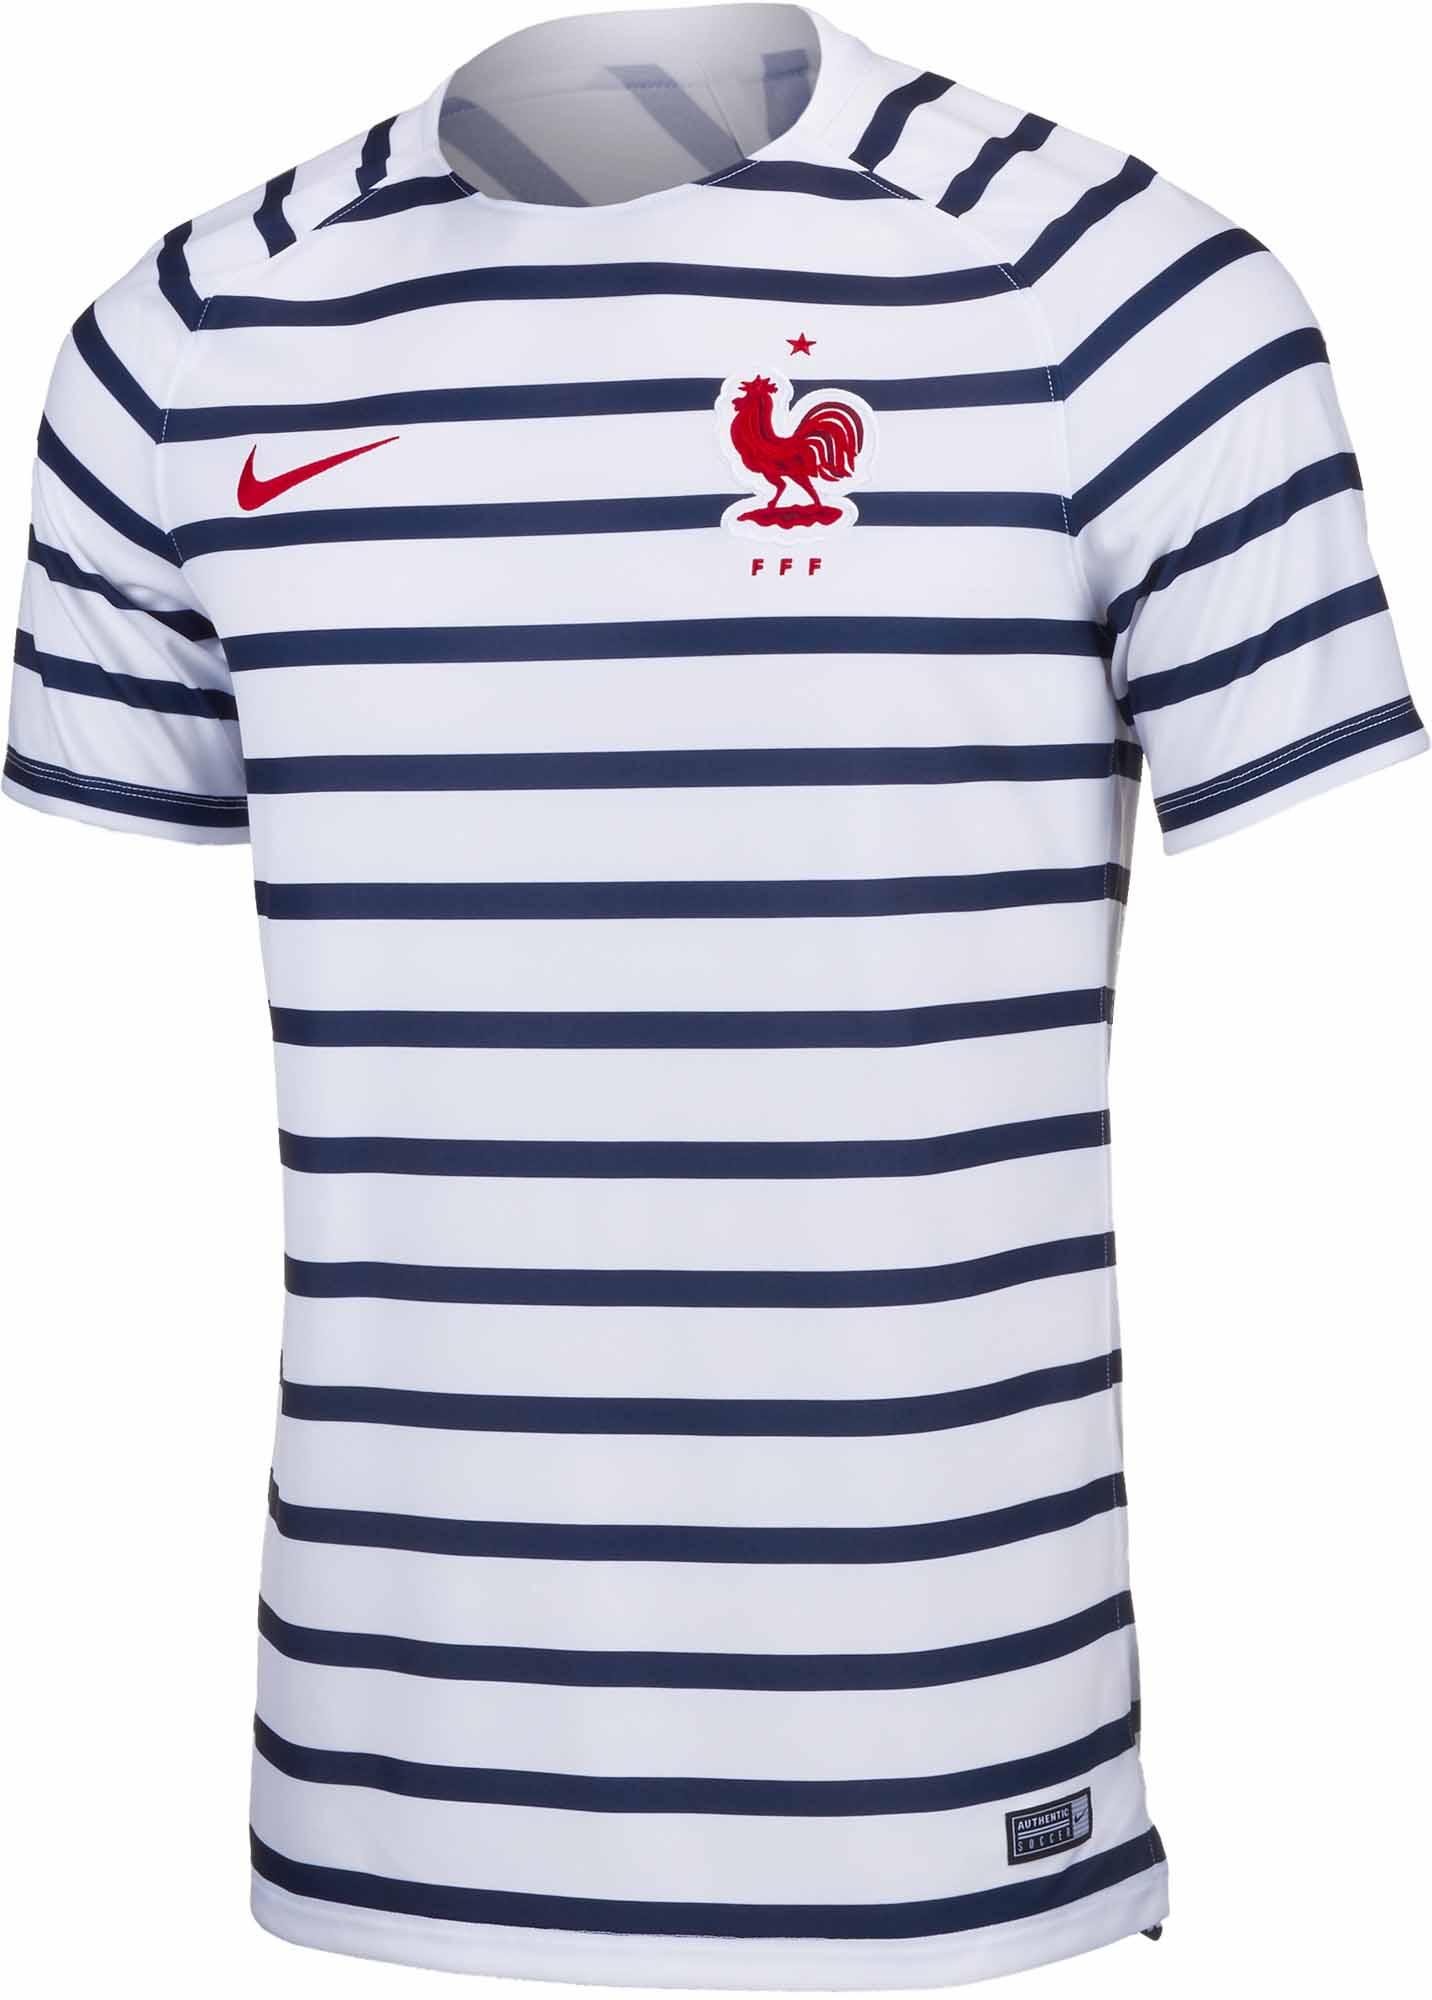 factory price 92f59 1836d Nike France Pre-Match Jersey 2018-19